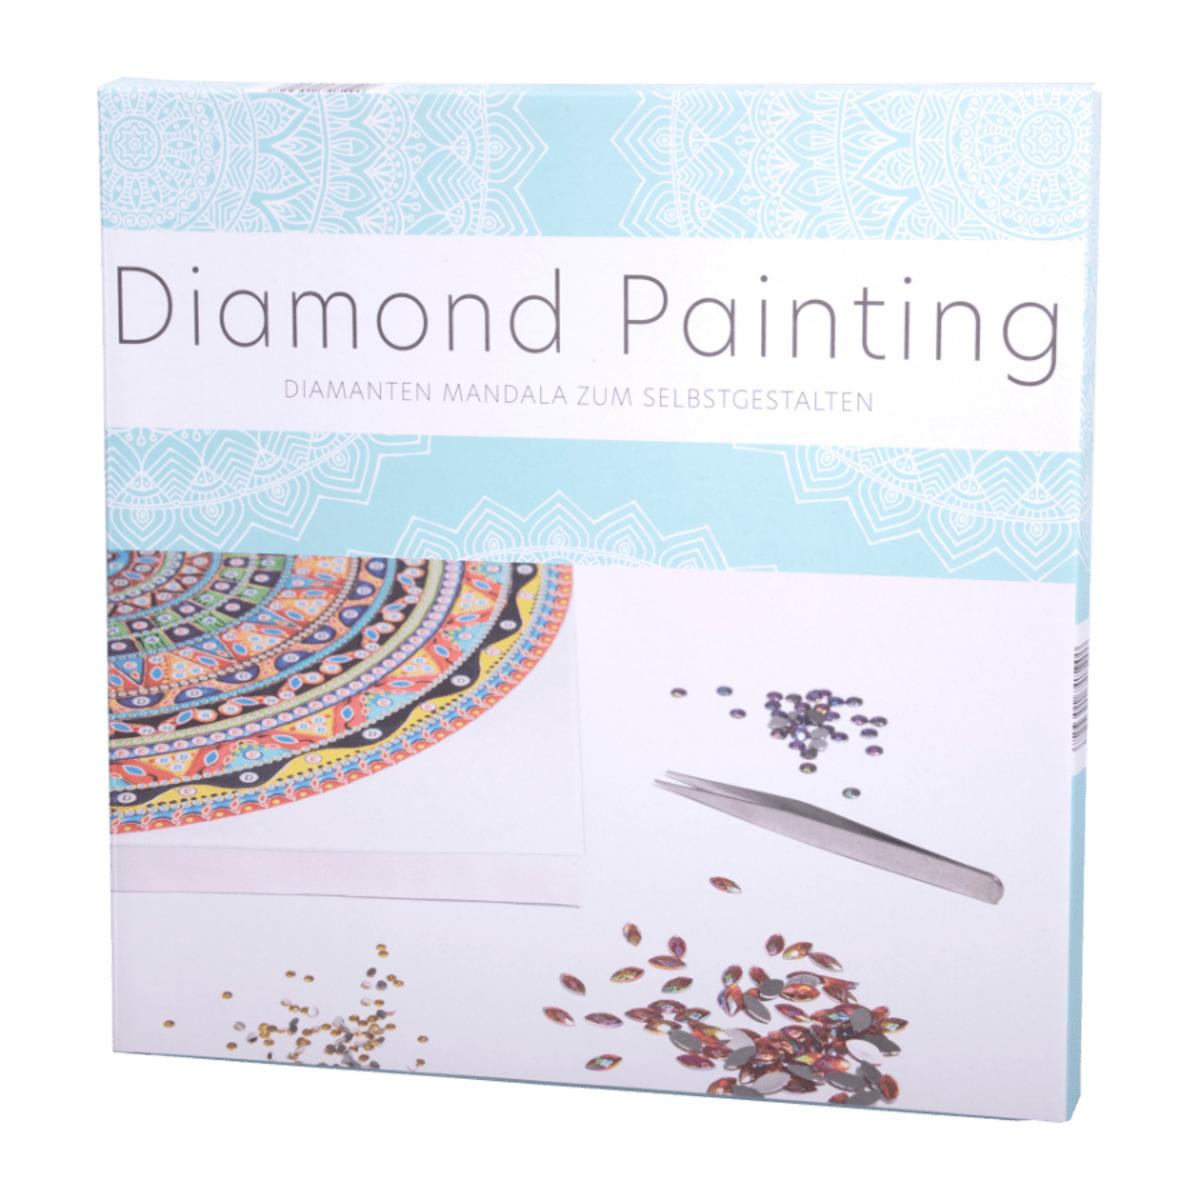 Bild 5 von Diamond Painting